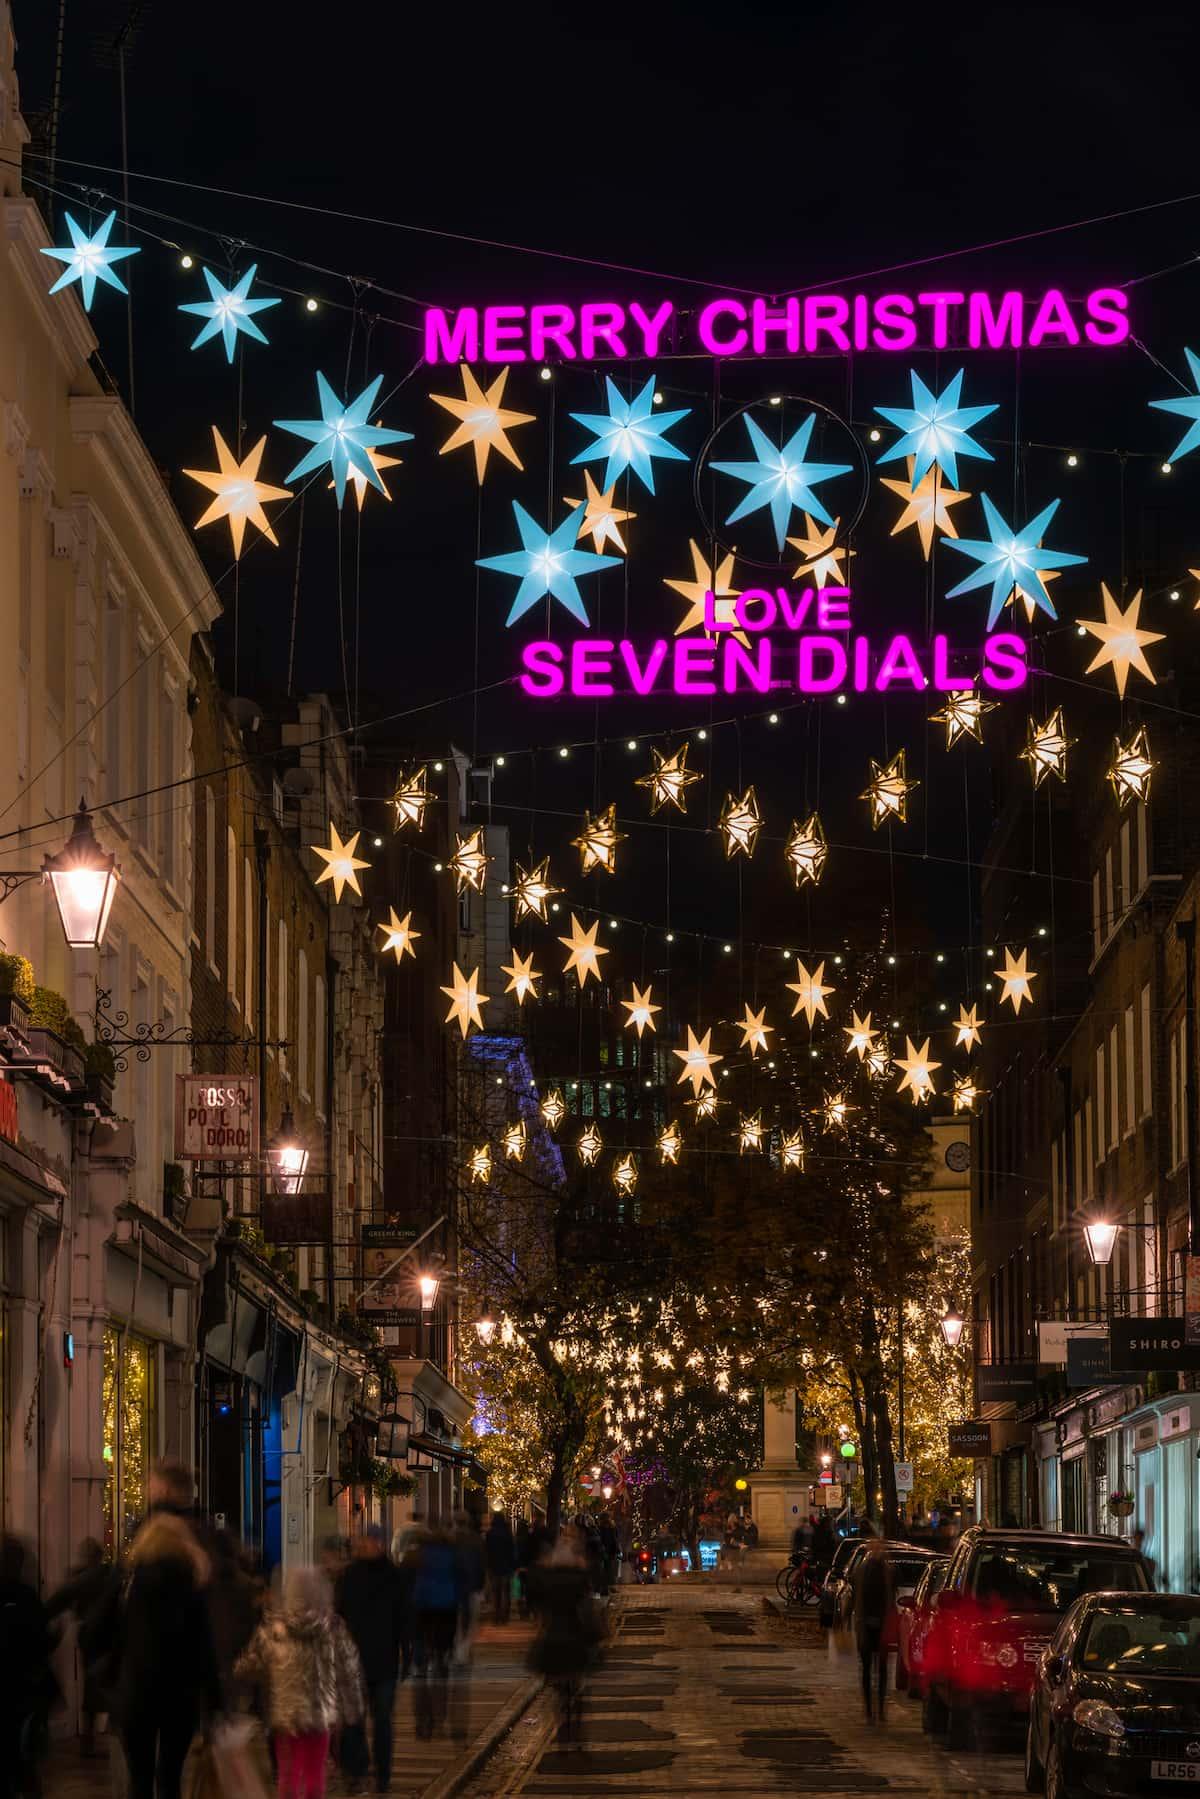 Seven Dials in Covent Garden, London